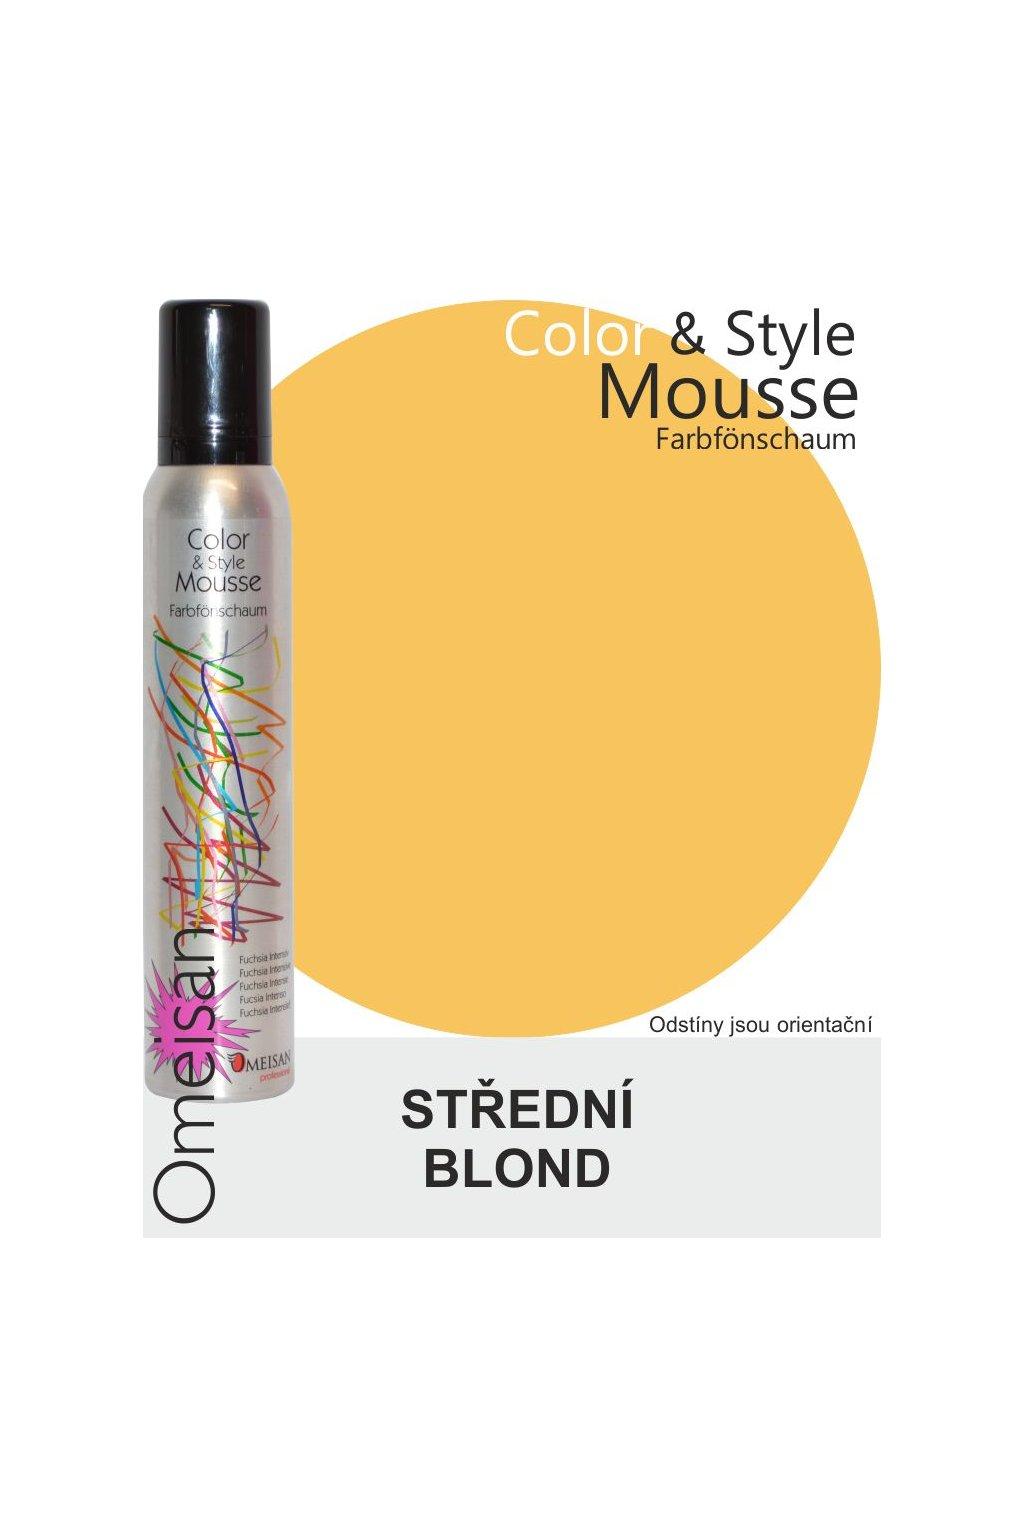 6470 omeisan barevna pena tuzici mittelblond 200ml stredni blond